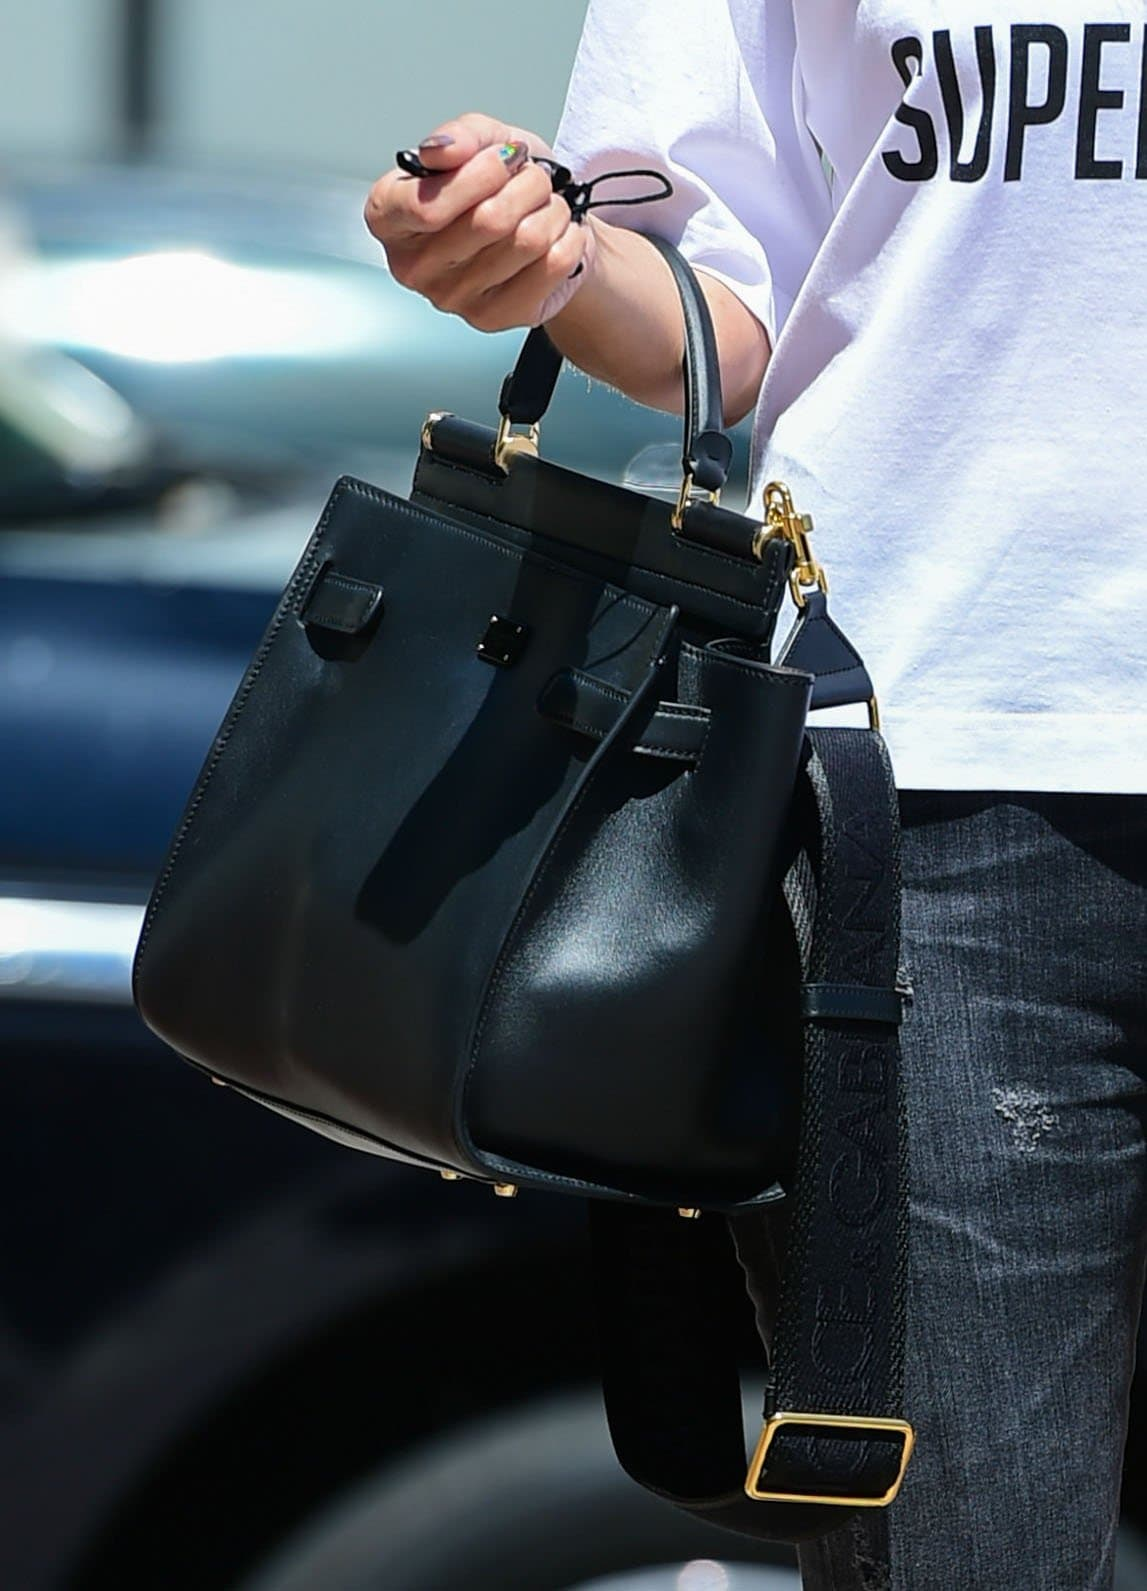 Heidi Klum carries a black Dolce & Gabbana Sicily handbag